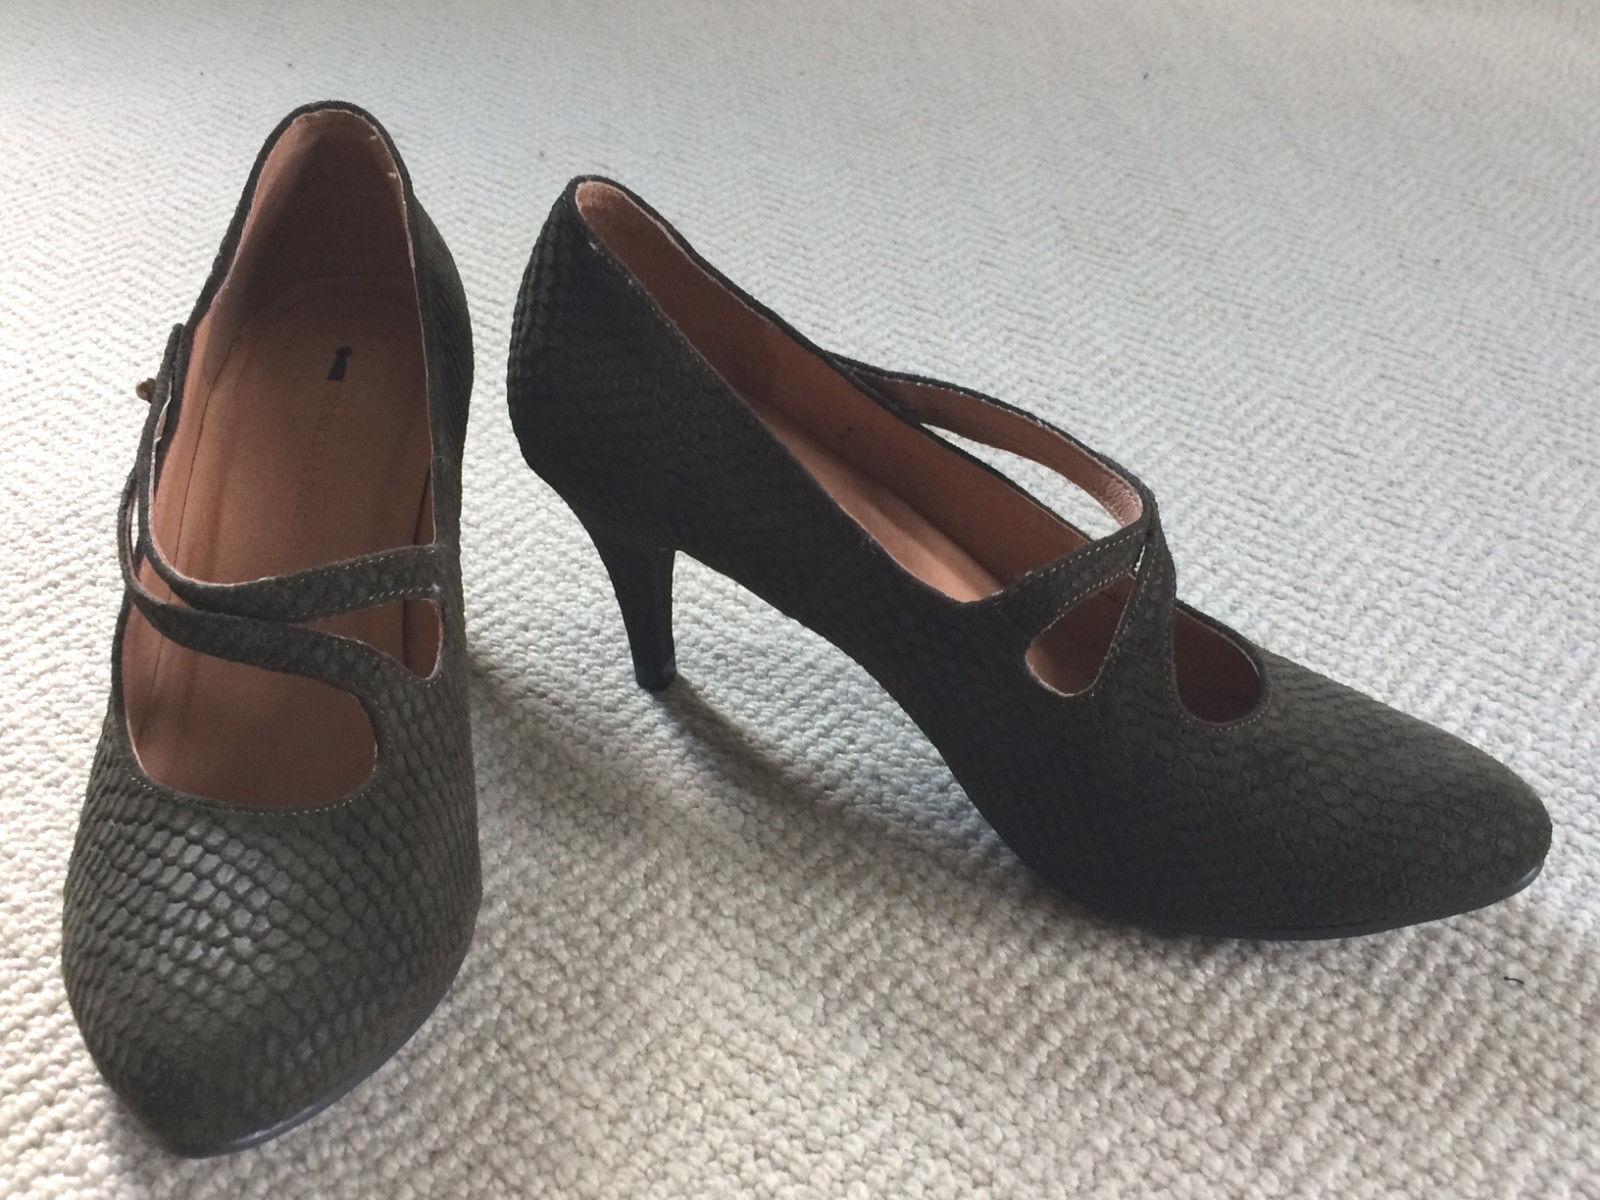 Anthropologie SCHULER & SONS Korey TextuROT Leder Heels, Dark Olive